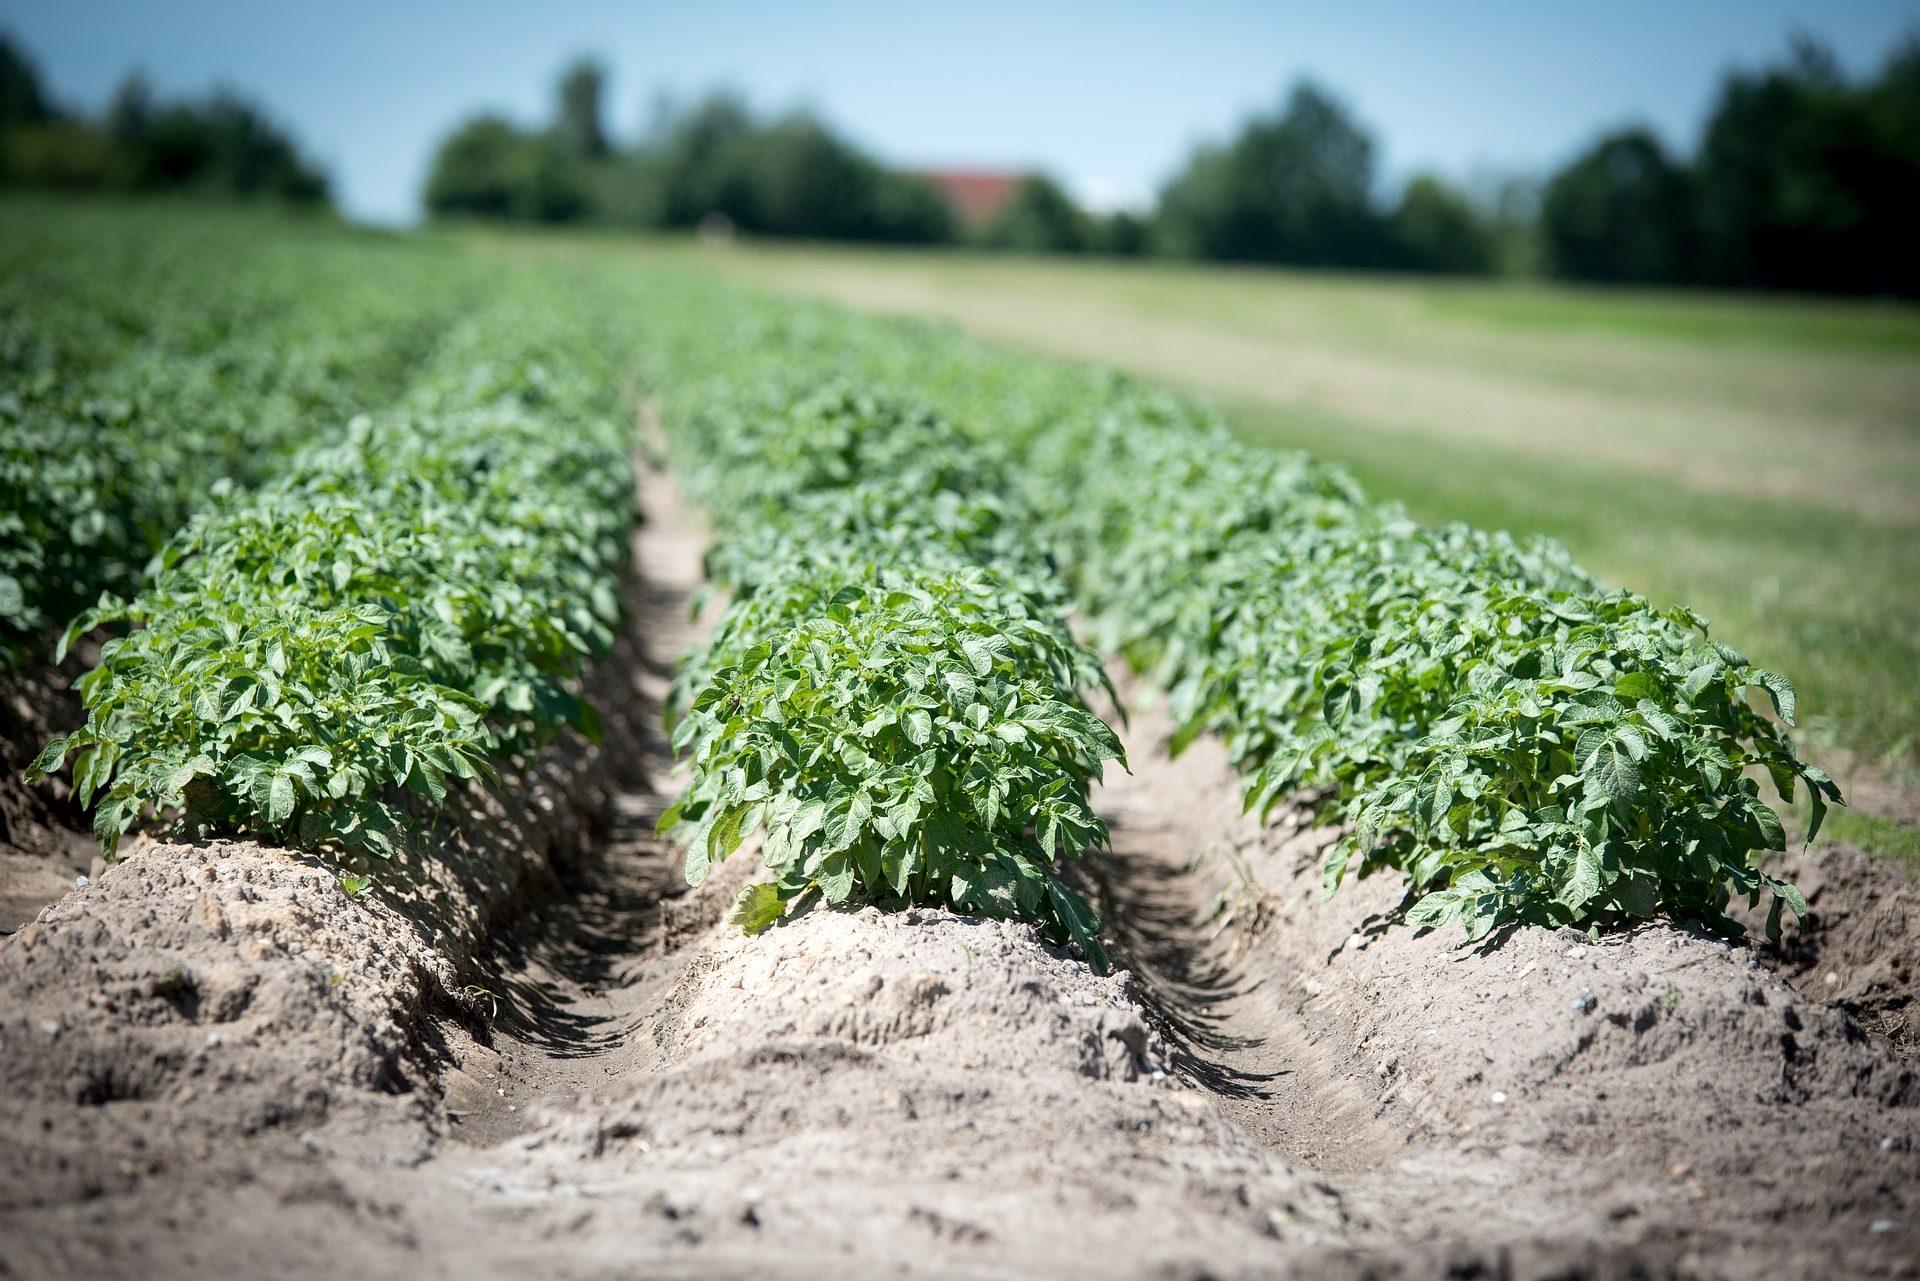 huerta, agricultura, plantación, patatas, campo - Fondos de Pantalla HD - professor-falken.com